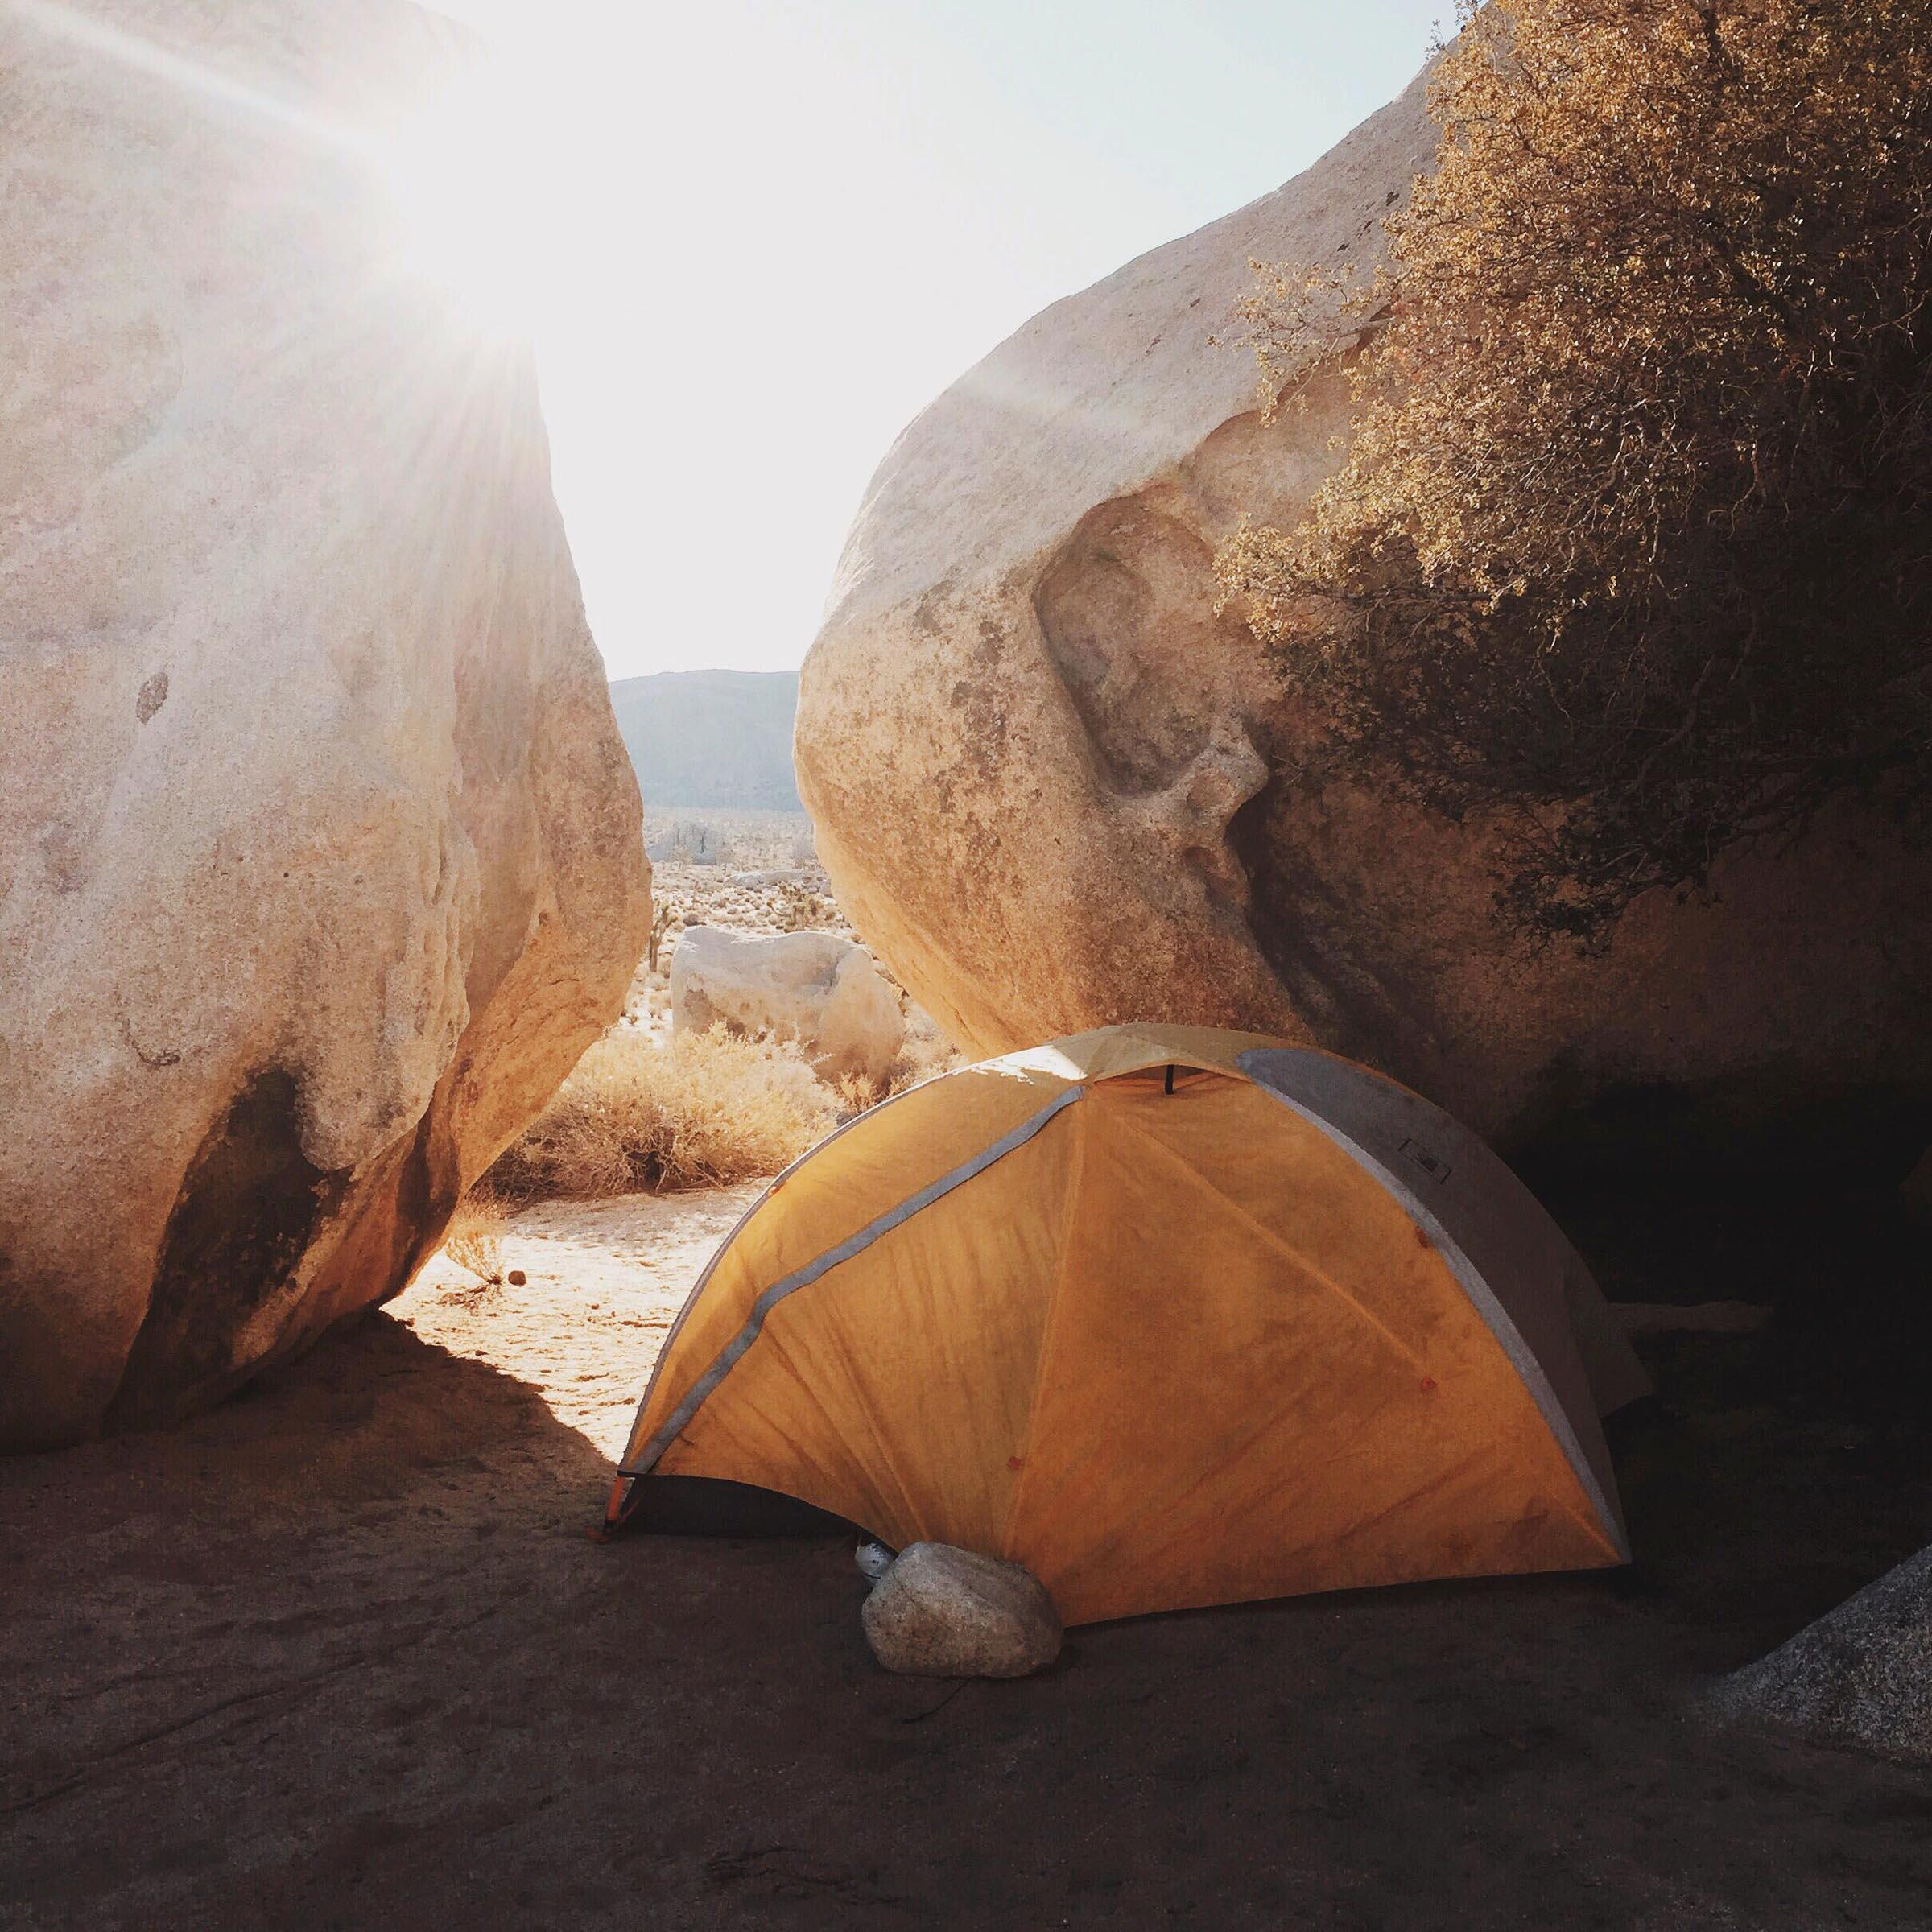 Camping in Joshua Tree | Katch Silva